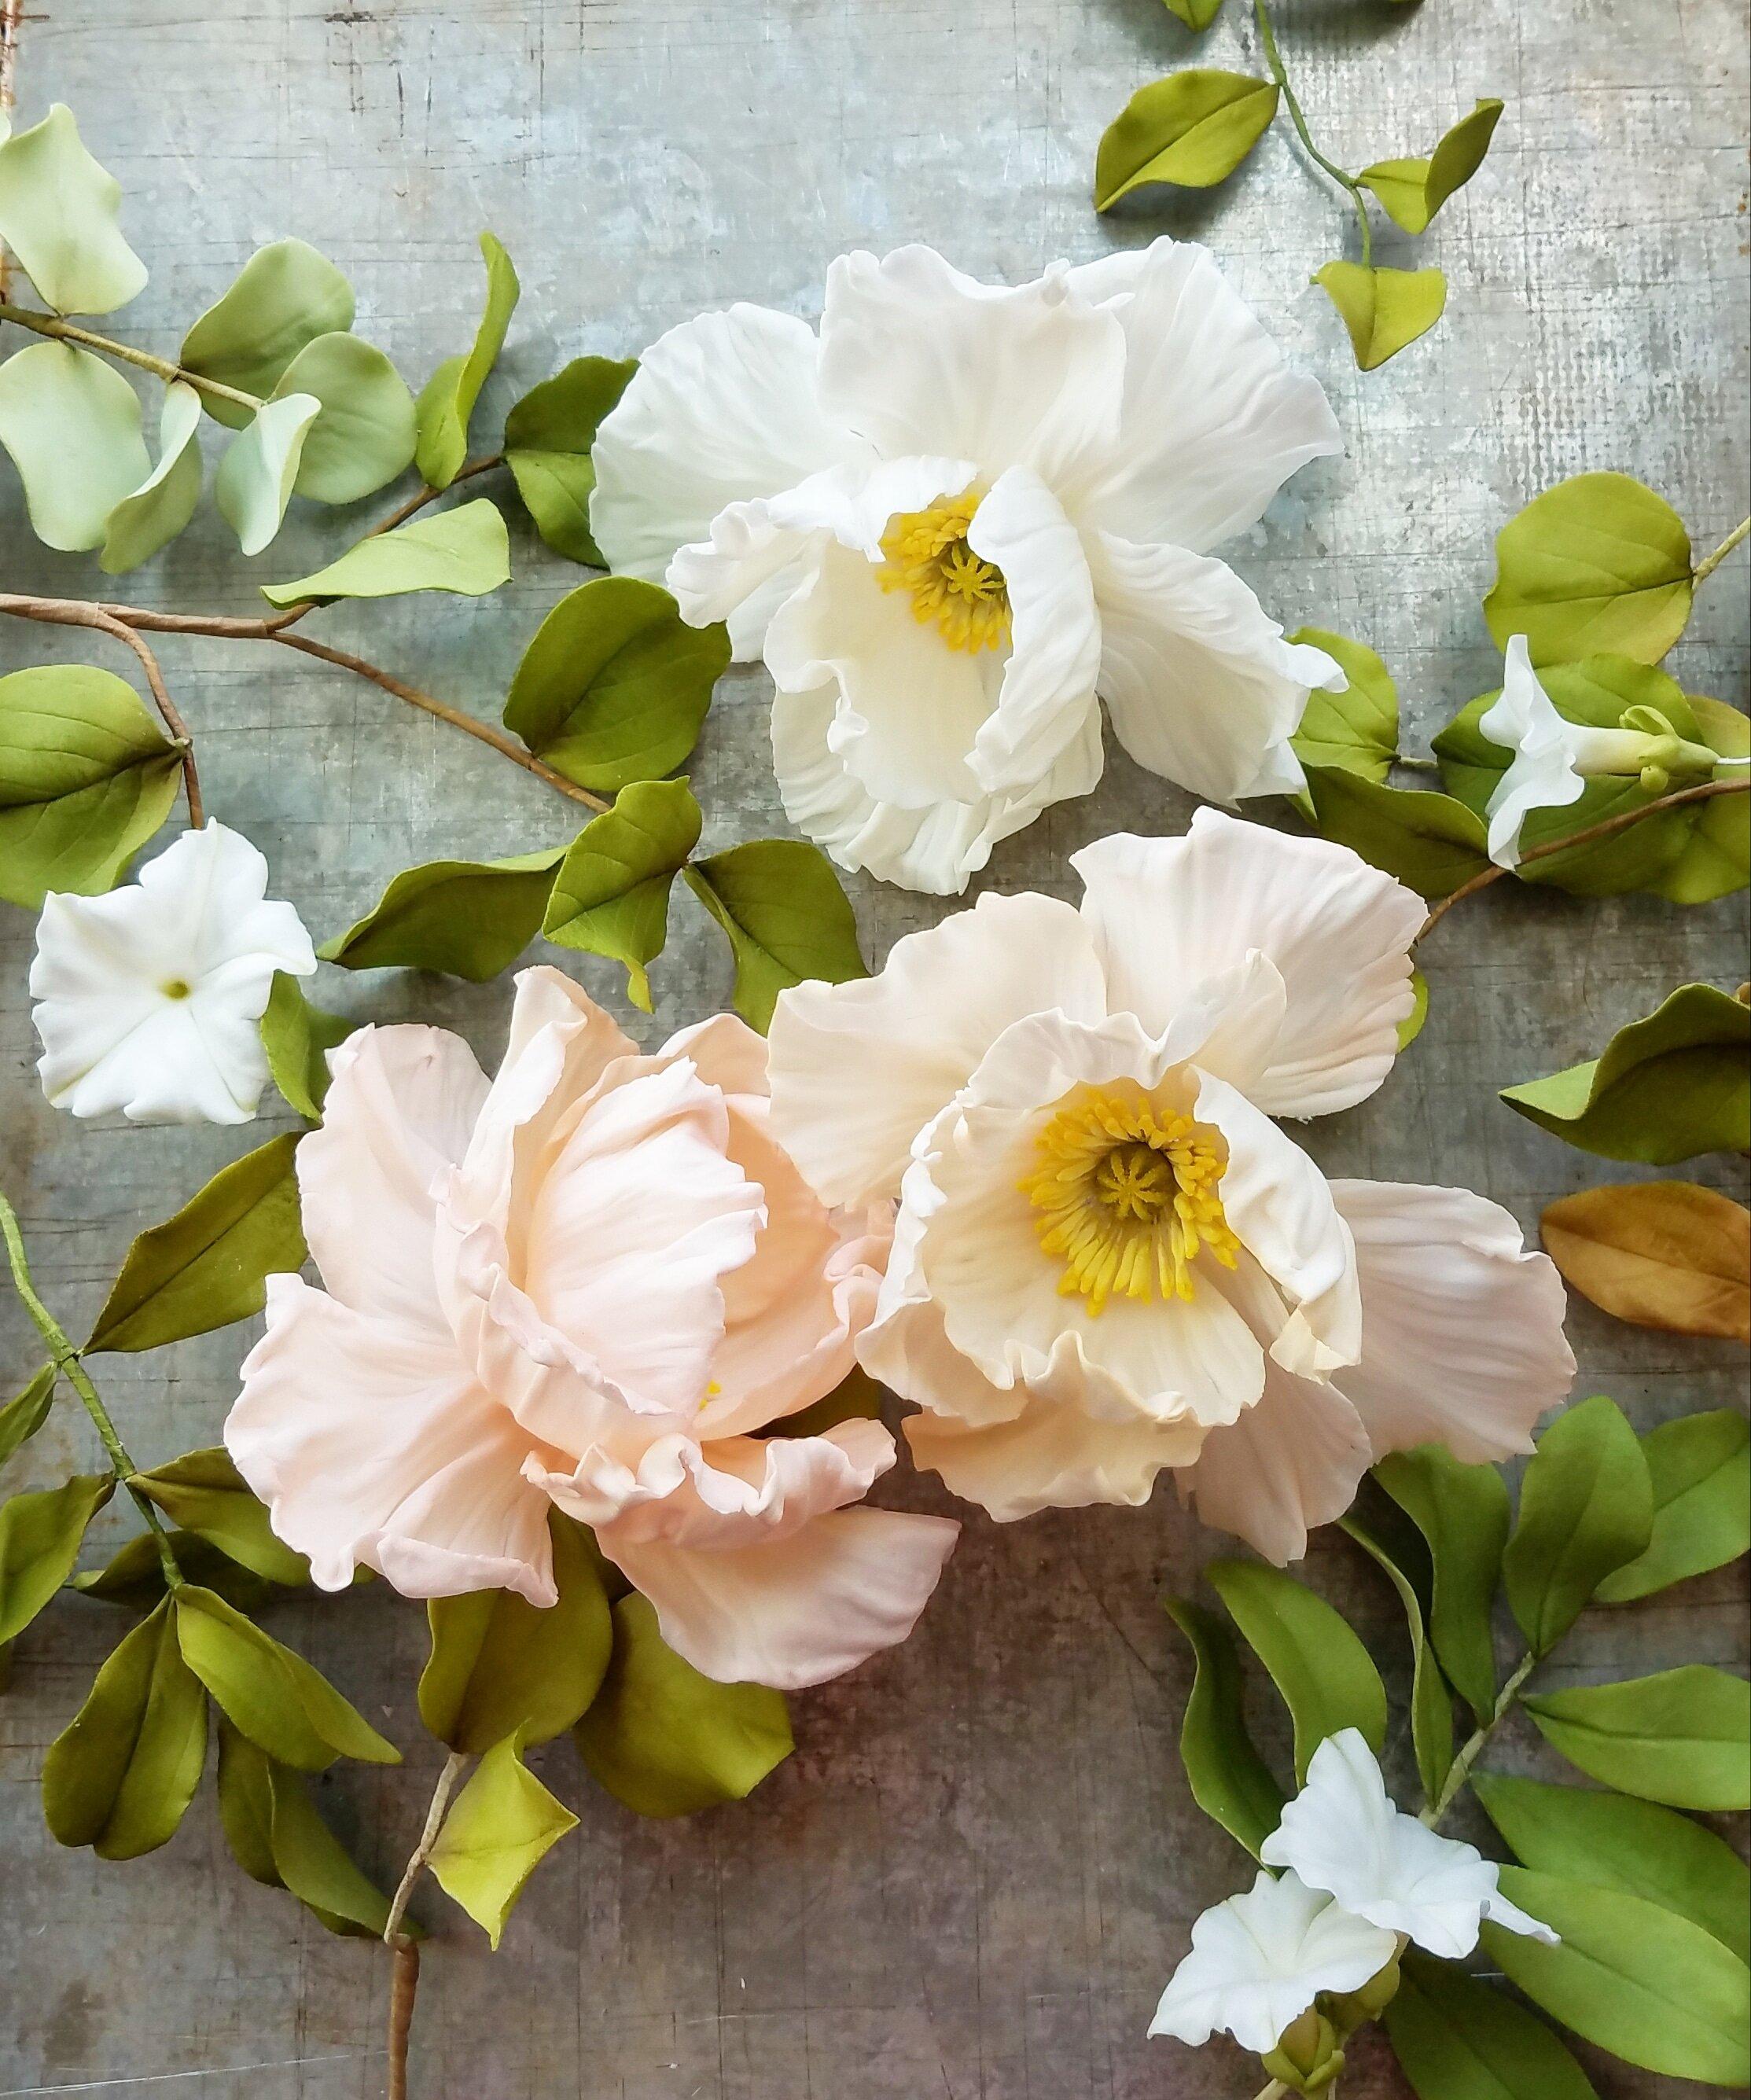 Petalsweet Poppies - Cakeheads DEMO.jpg